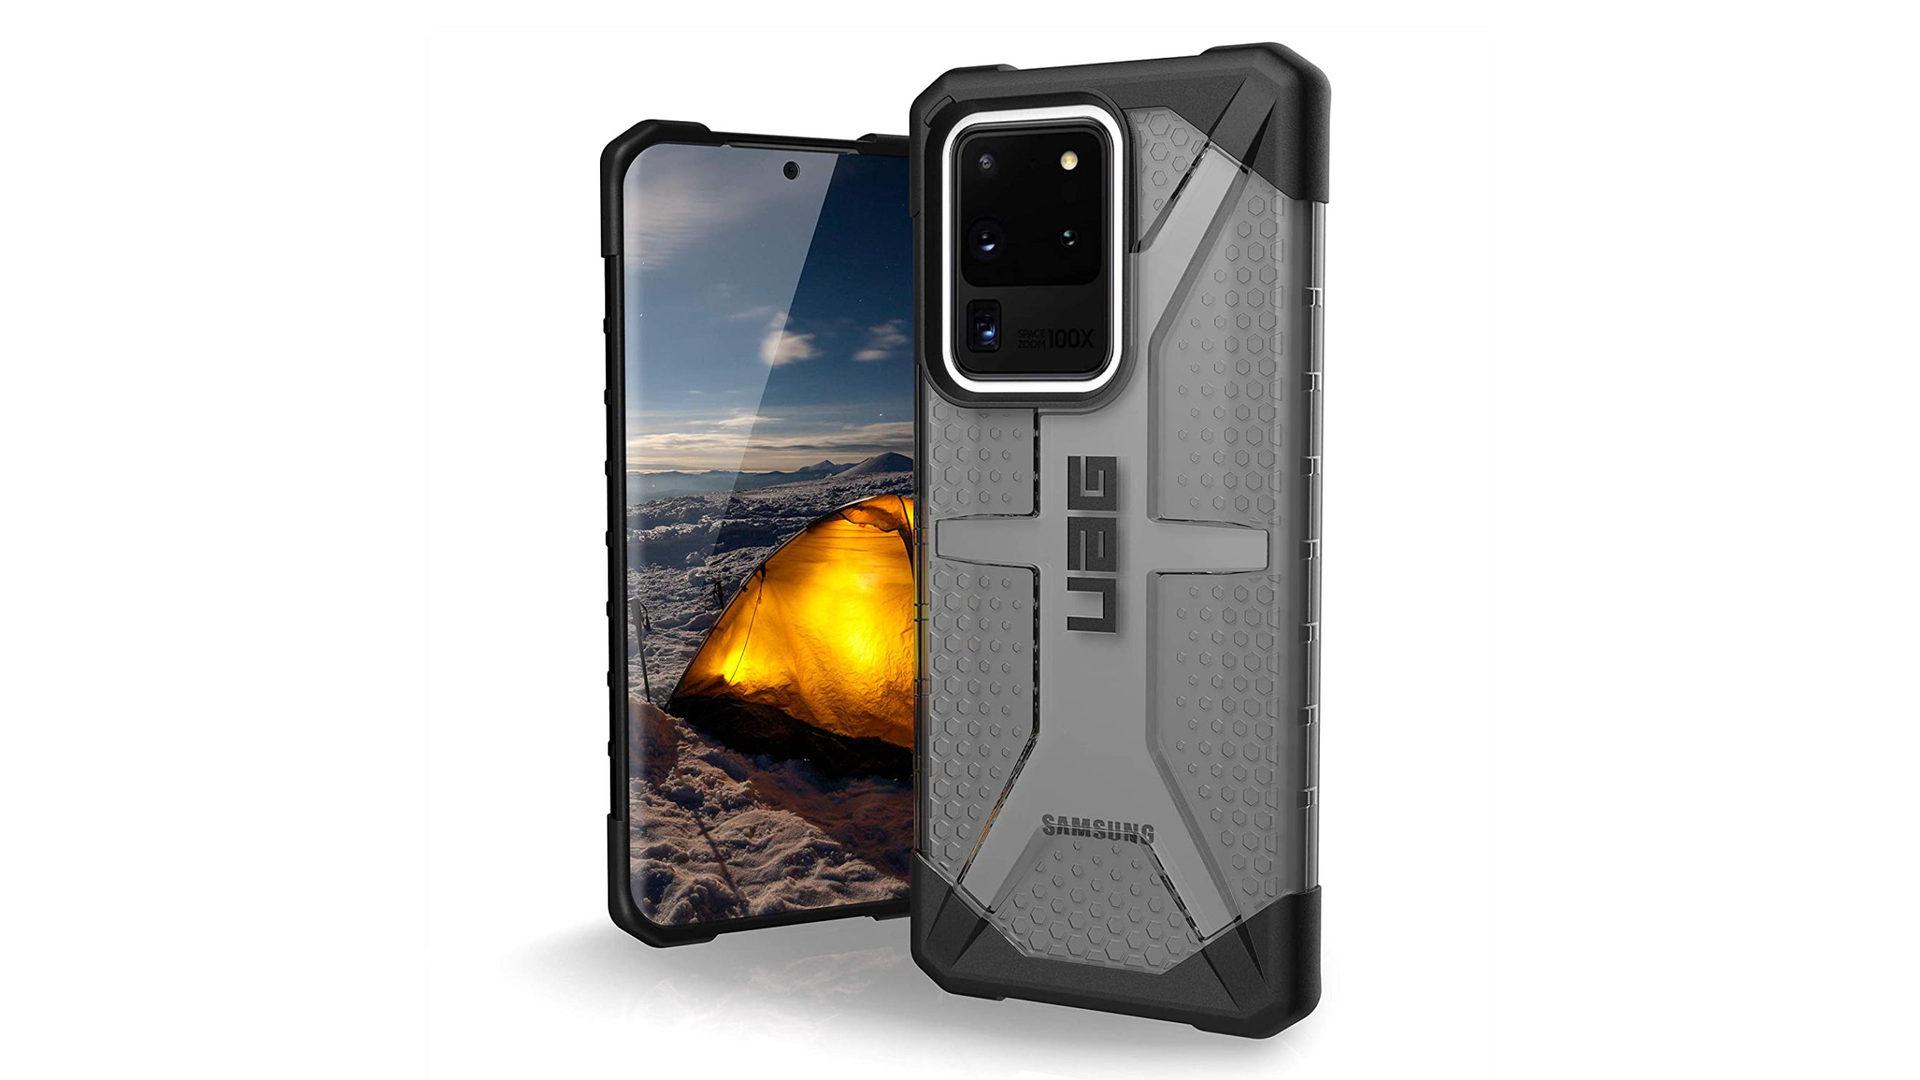 UAG case for Samsung Galaxy S20 Ultra